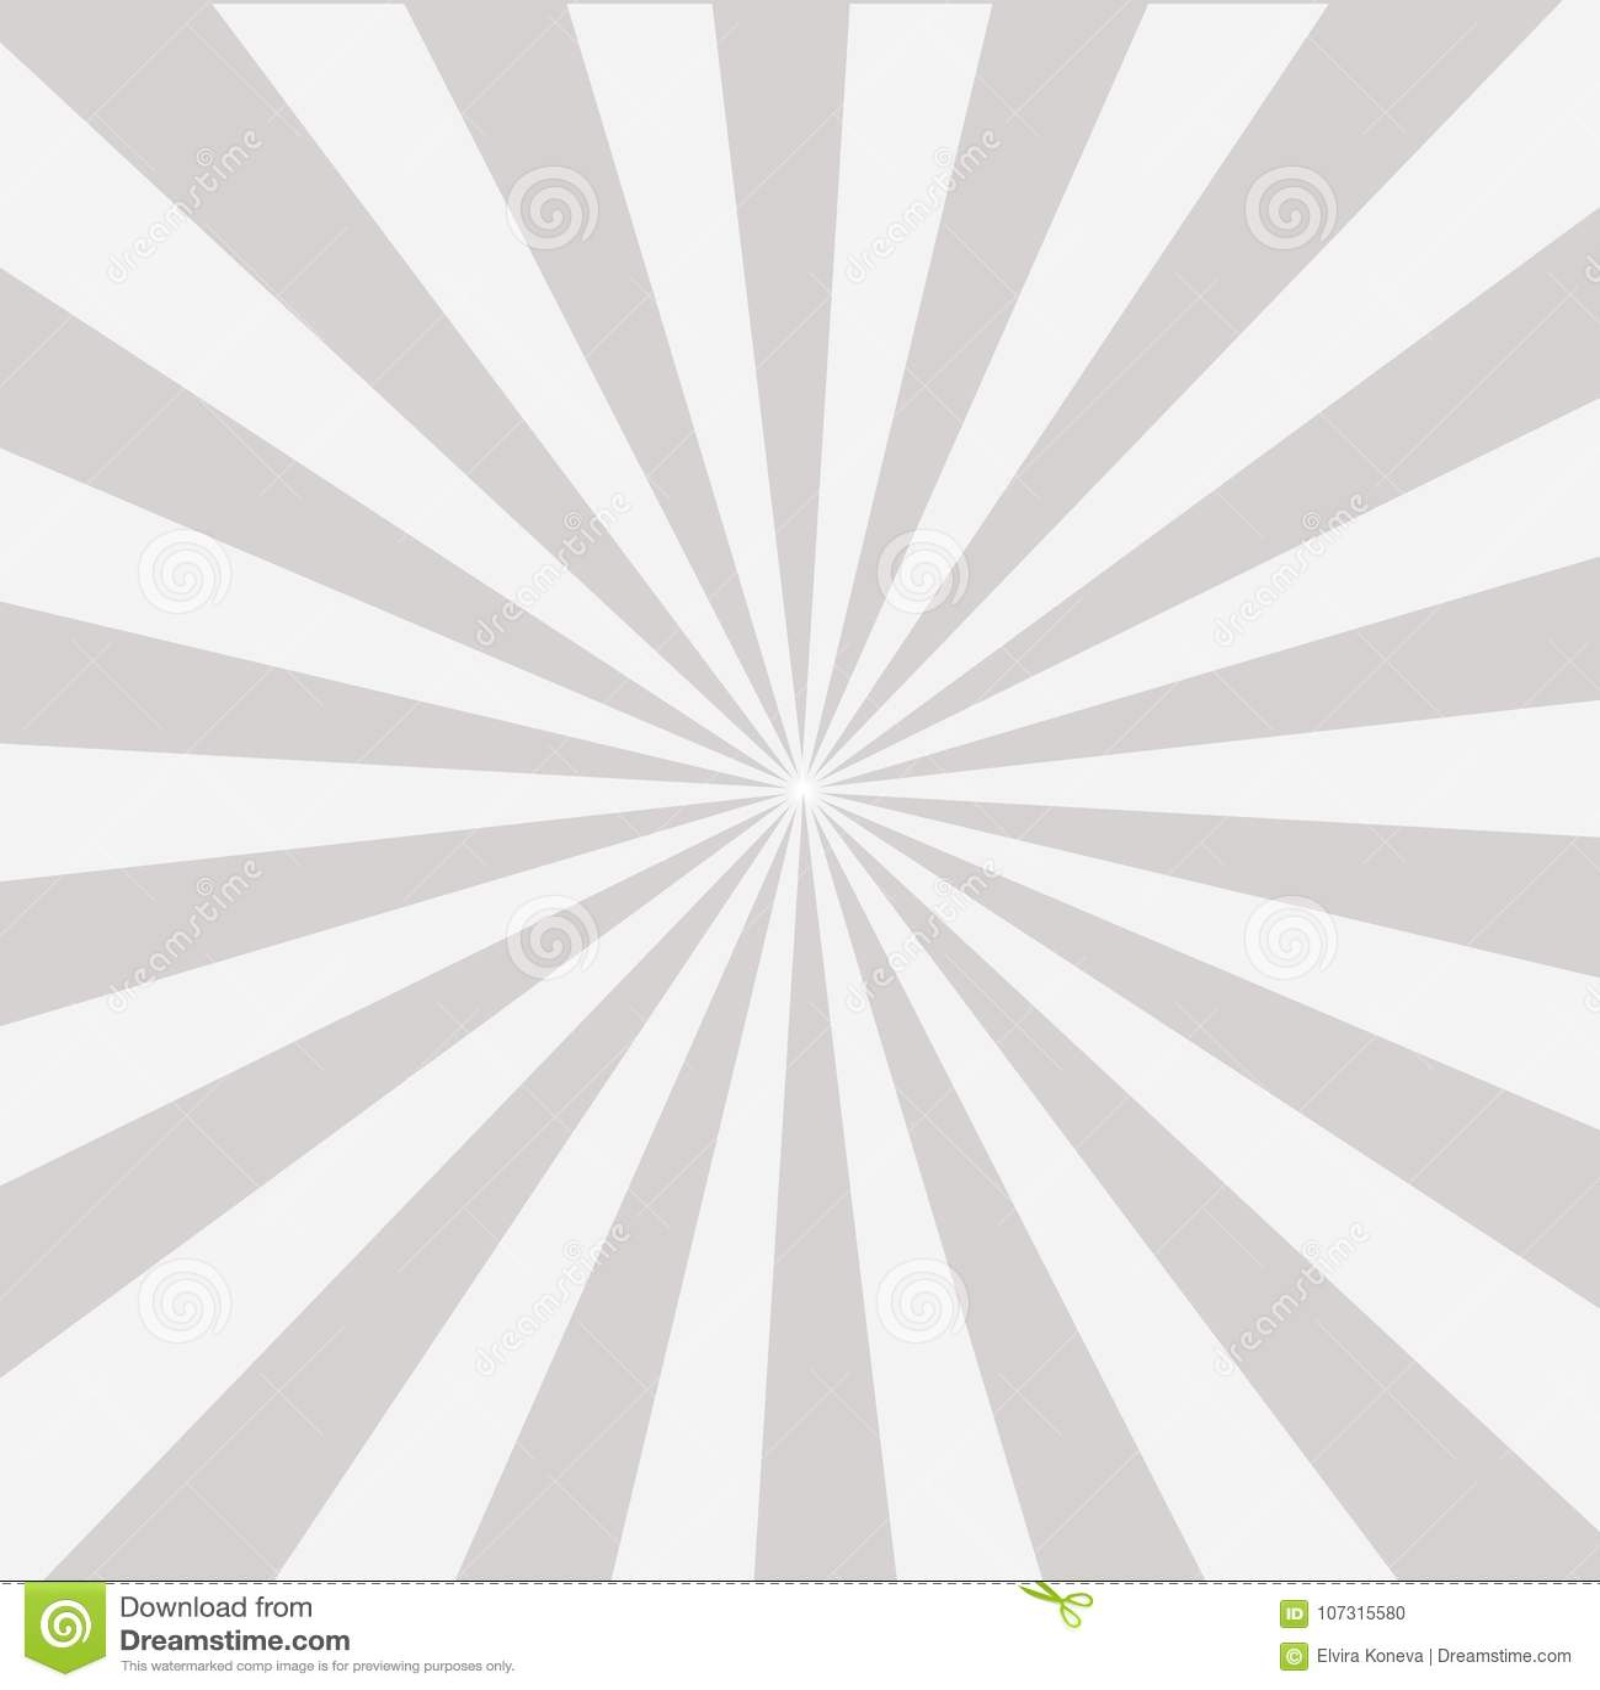 be34c9c94df Shiny Sun Ray Background. Sun Sunburst Pattern. Grey Rays Summer ...